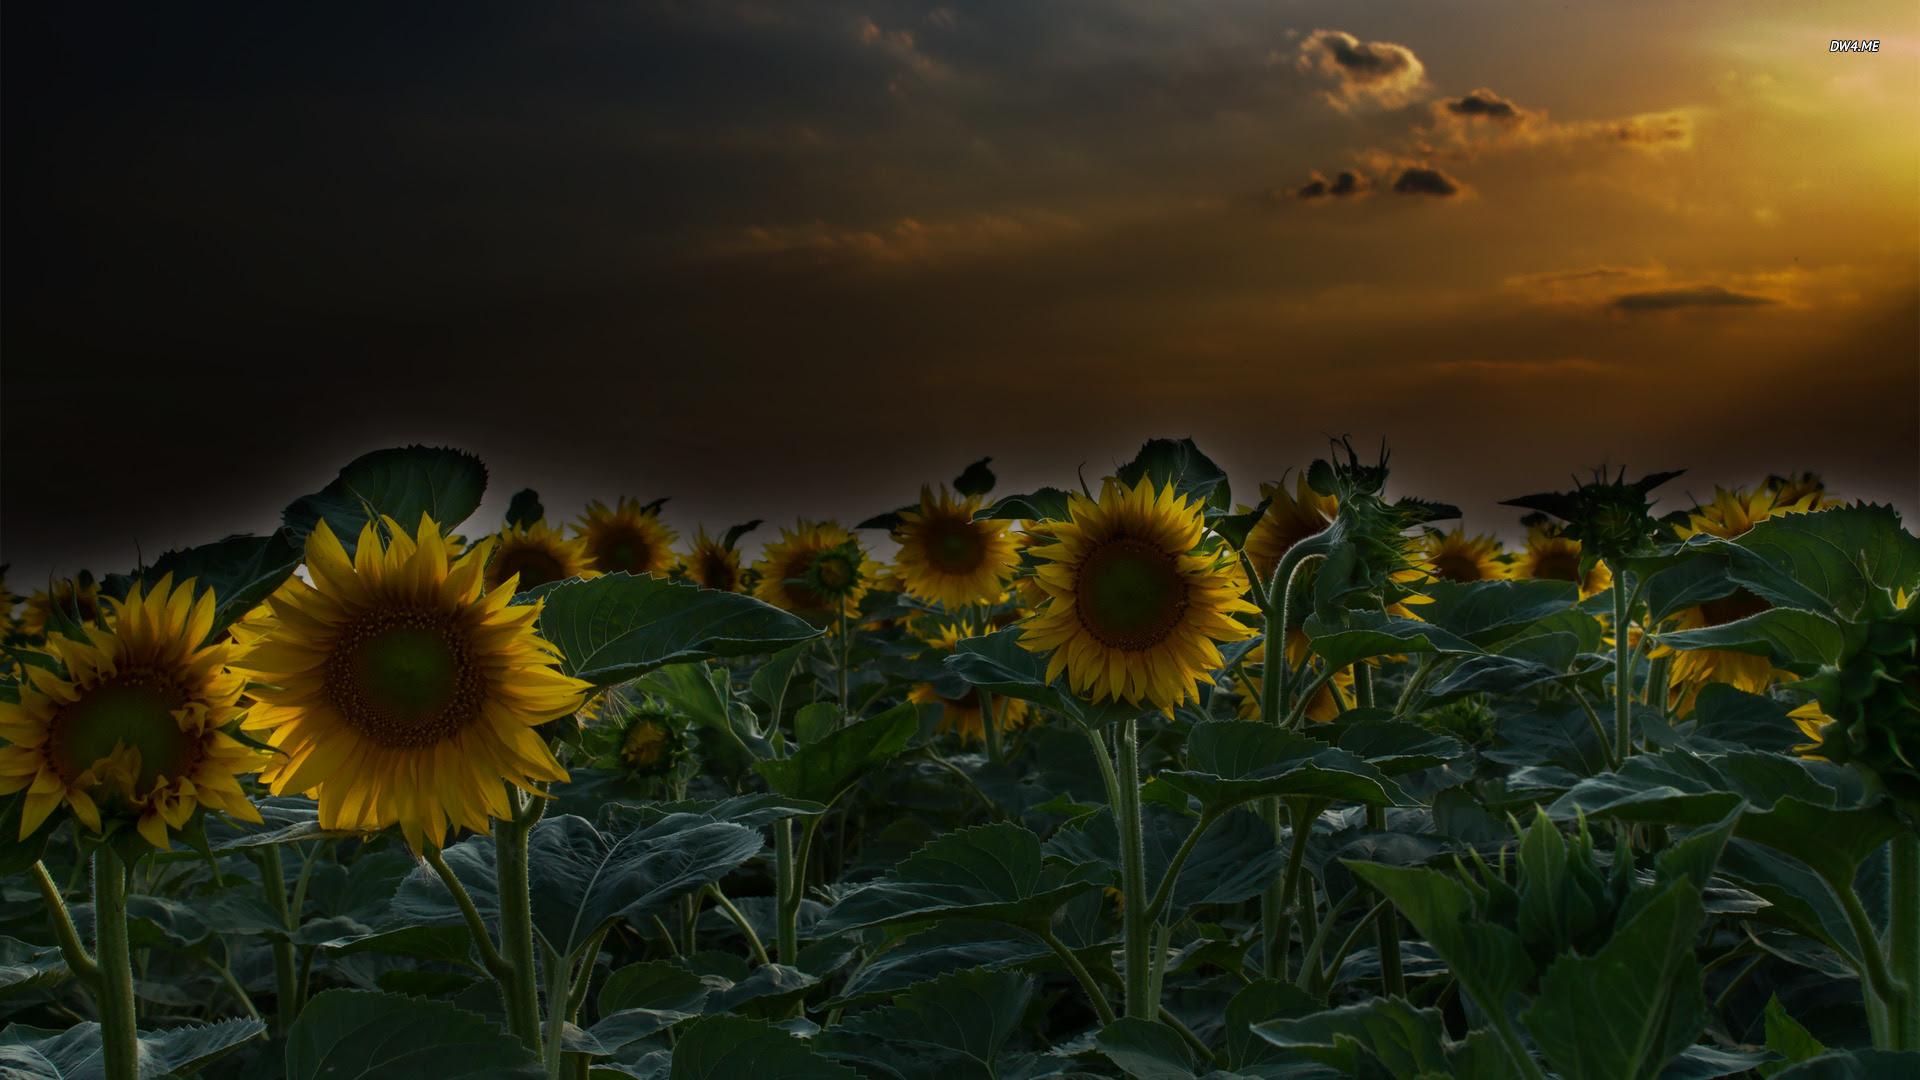 Field of Sunflowers Wallpaper - WallpaperSafari